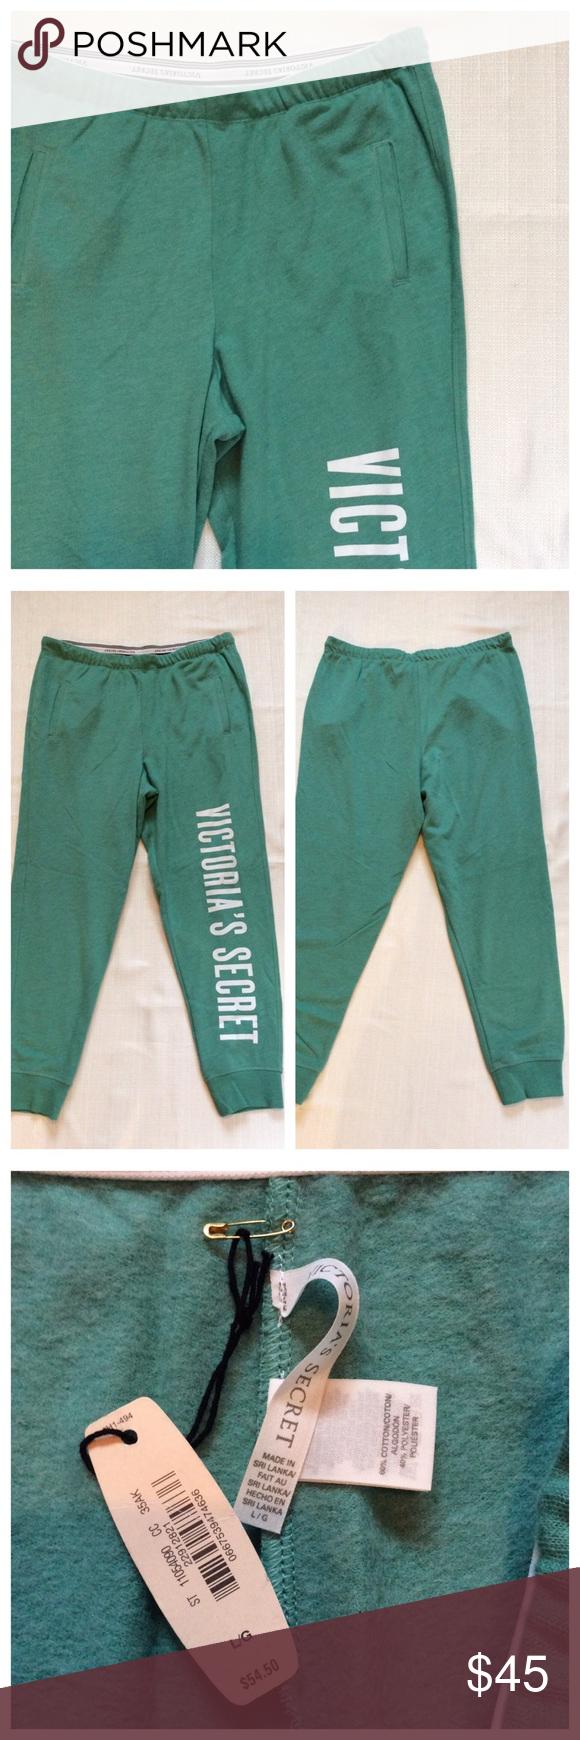 VS Green Lounge Pants NWT loungewear. Excellent unworn condition. Victoria's Secret Pants